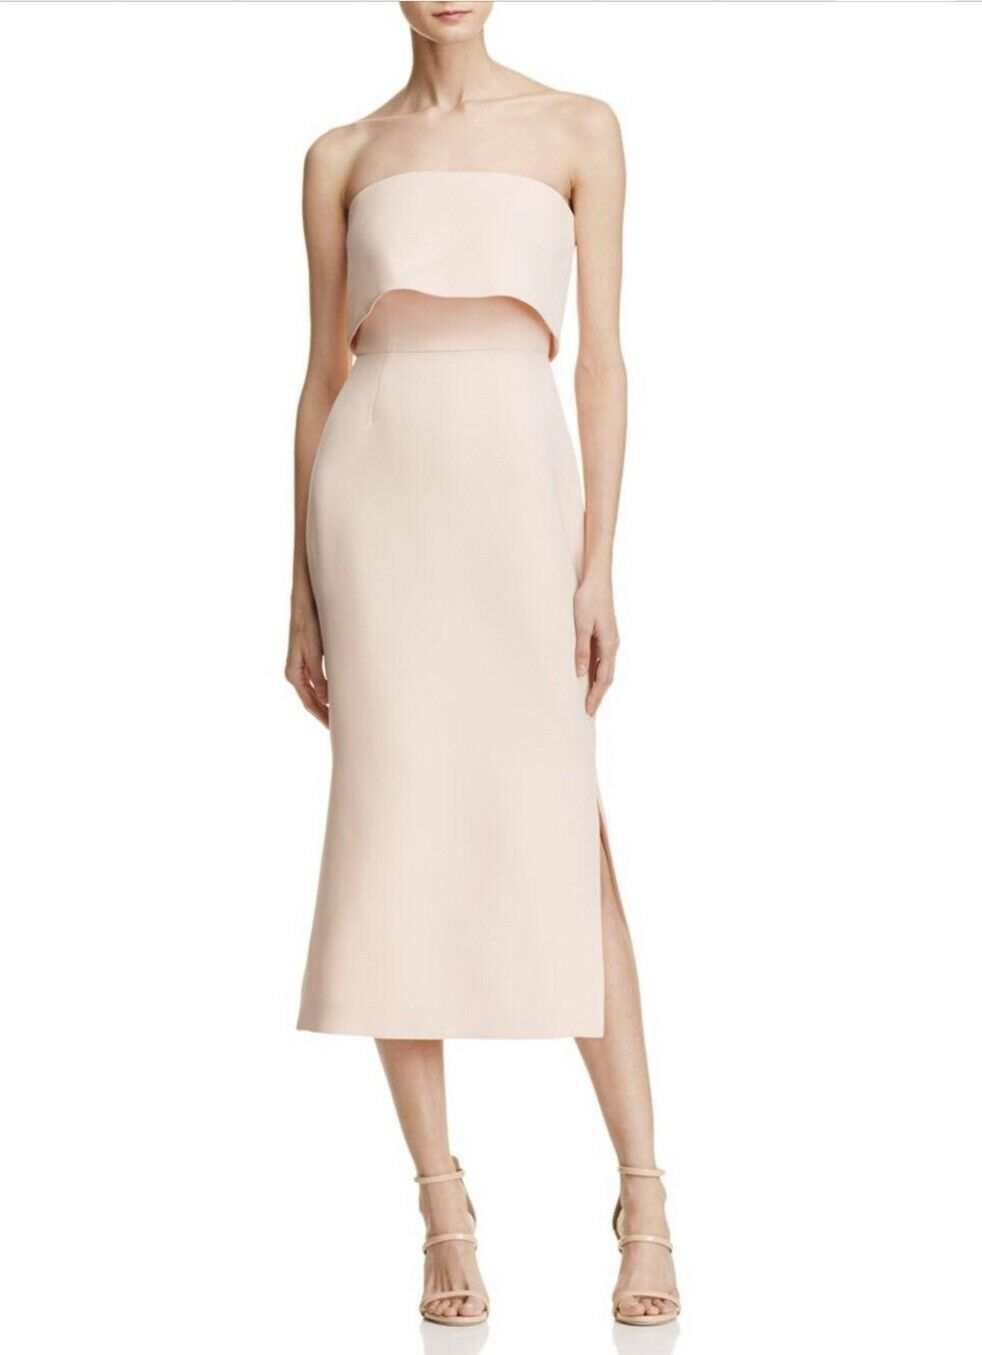 NWT C MEO COLLECTIVE Fresh Start Strapless Textured Midi Pencil Dress Size XS